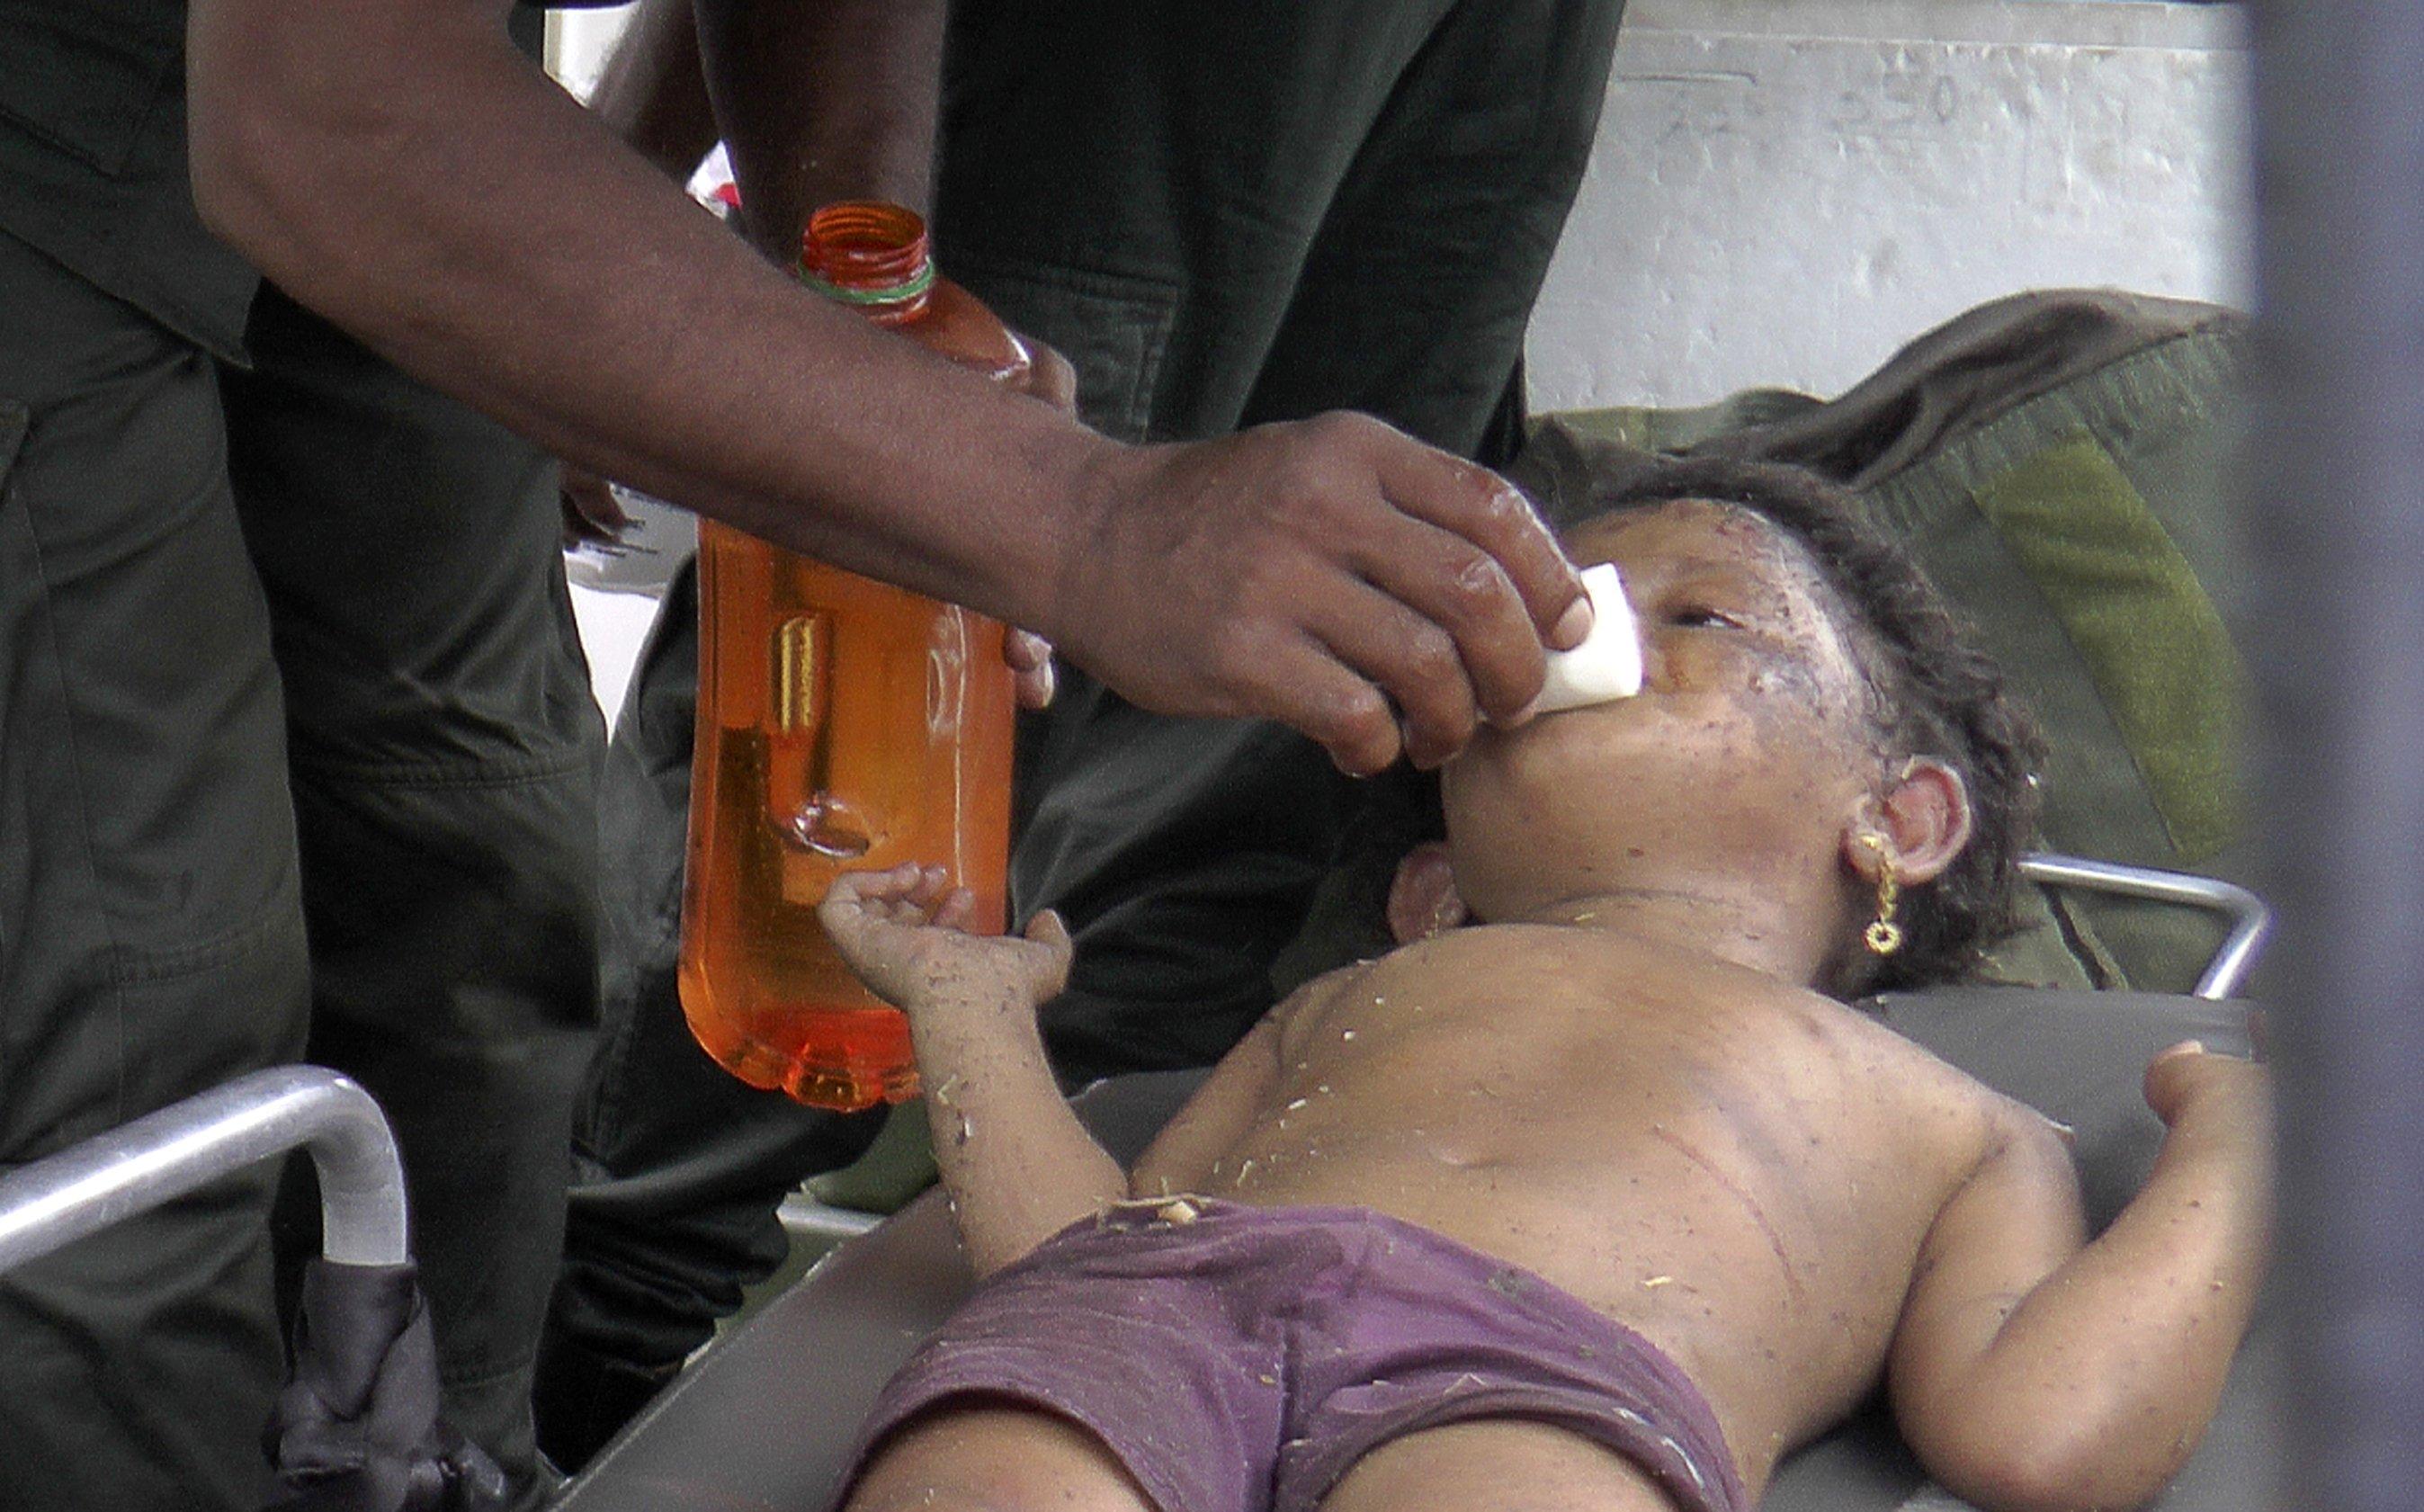 Sri Lanka militants set off bombs during raid, killing 15